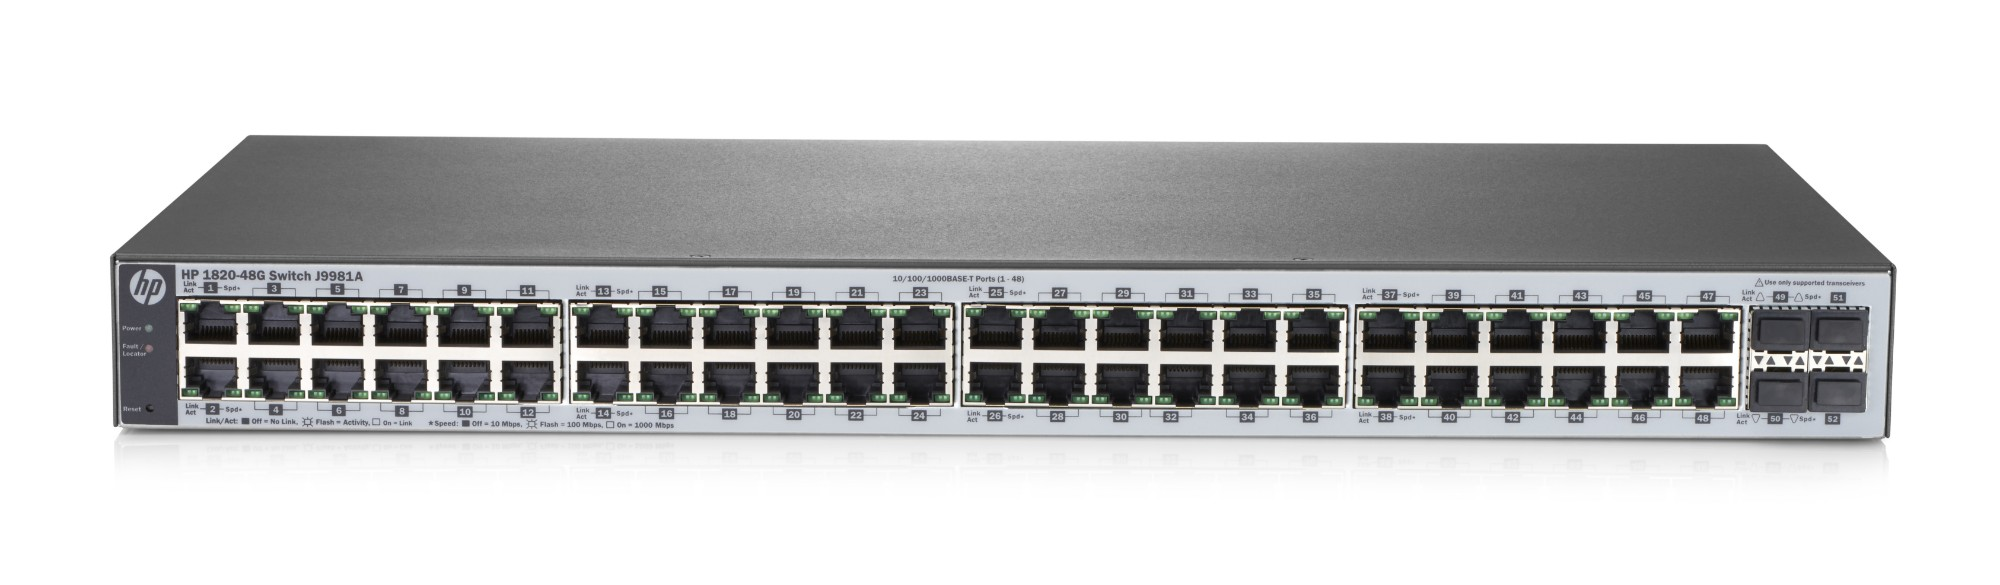 Hewlett Packard Enterprise 1820-48G Managed L2 Gigabit Ethernet (10/100/1000) Grey 1U